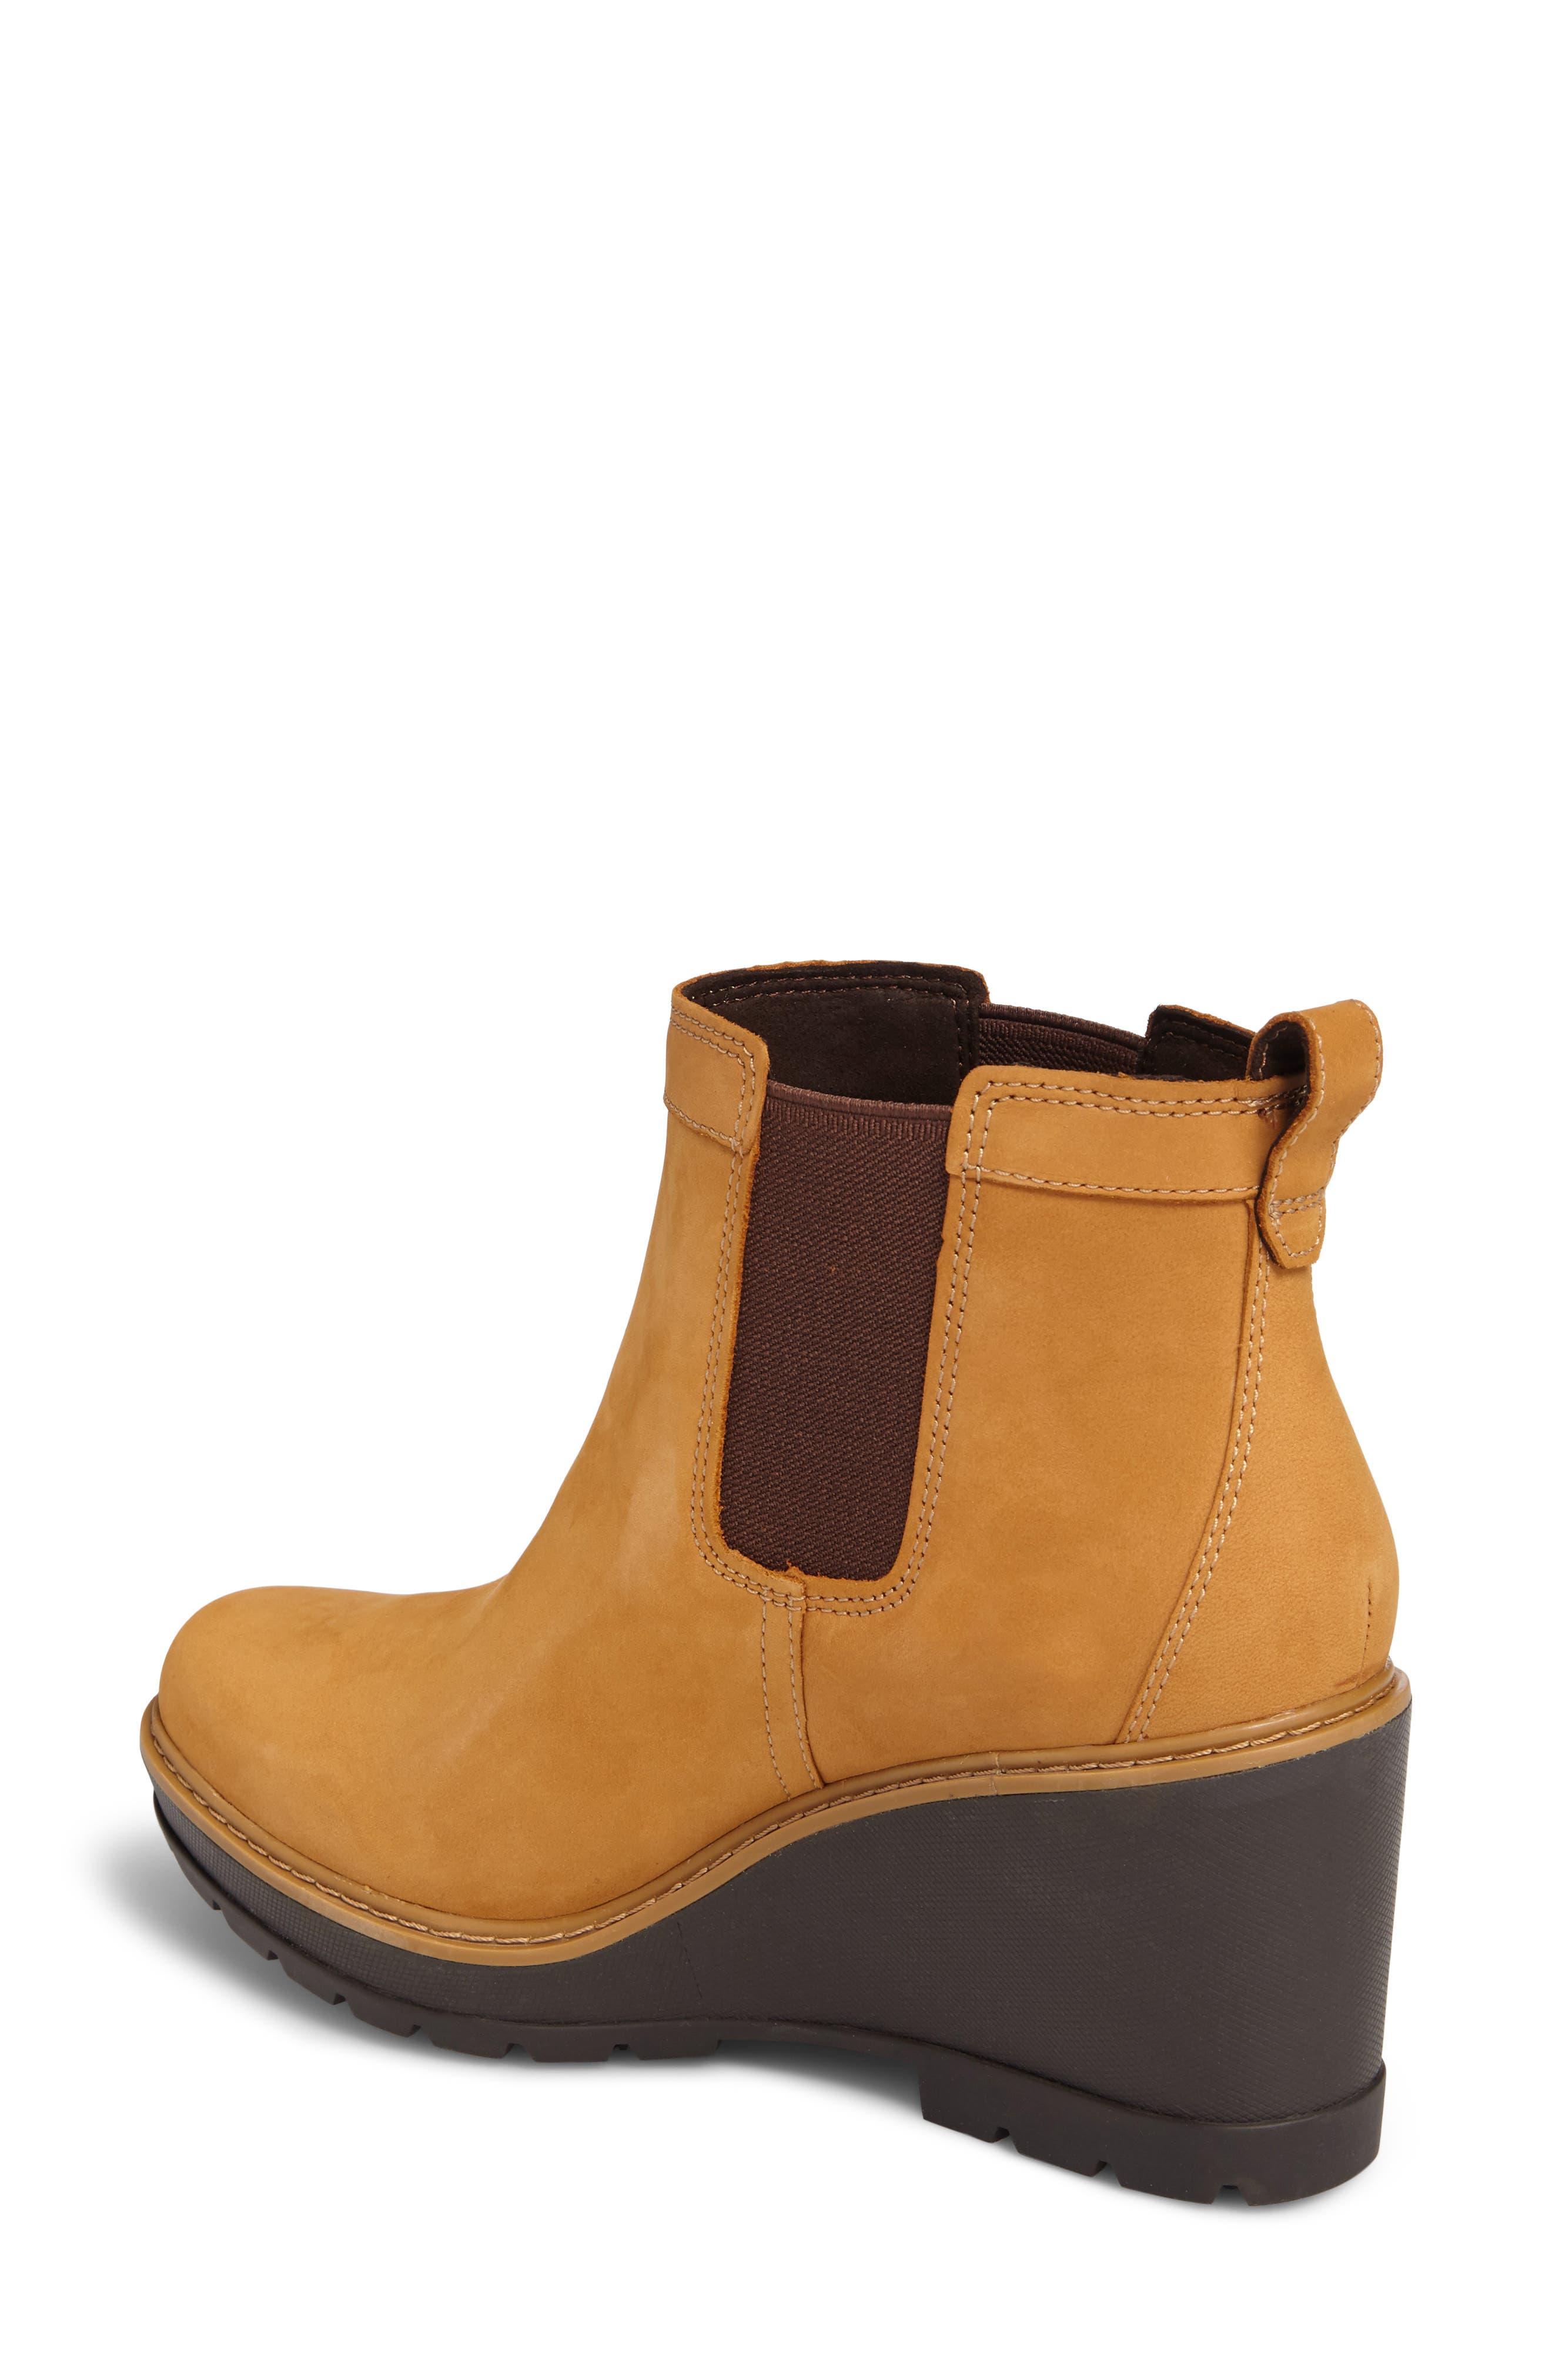 Kellis Water Resistant Chelsea Wedge Boot,                             Alternate thumbnail 2, color,                             211